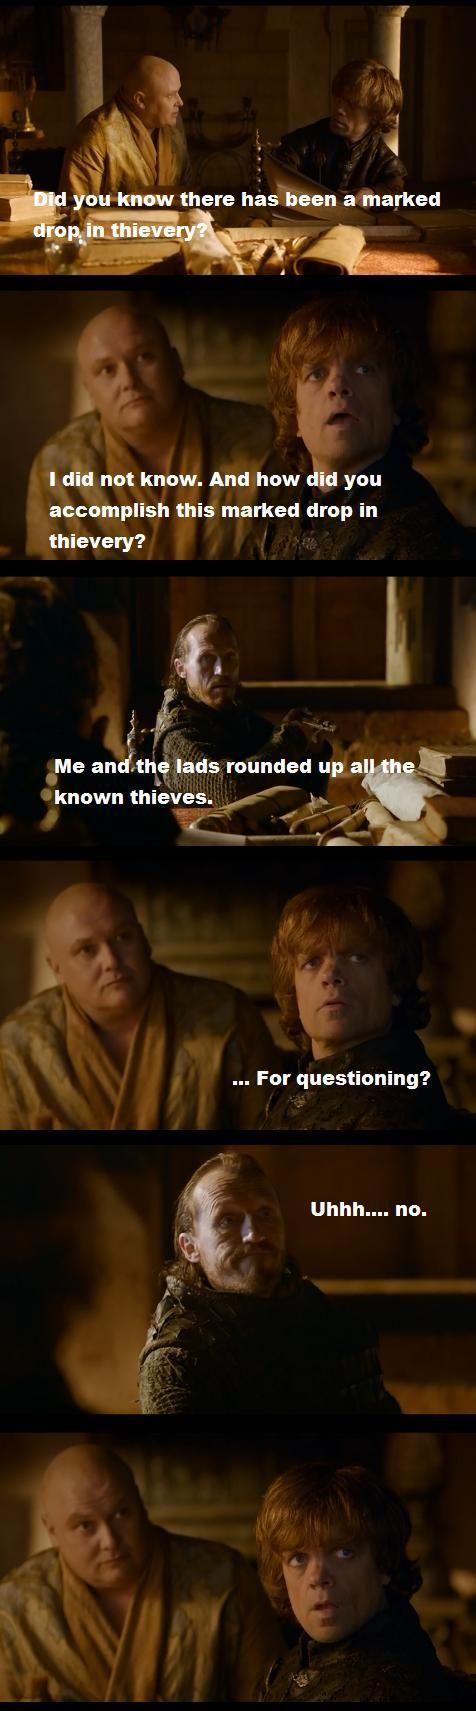 Lord Varys, Tyrion Lannister, & Bronn